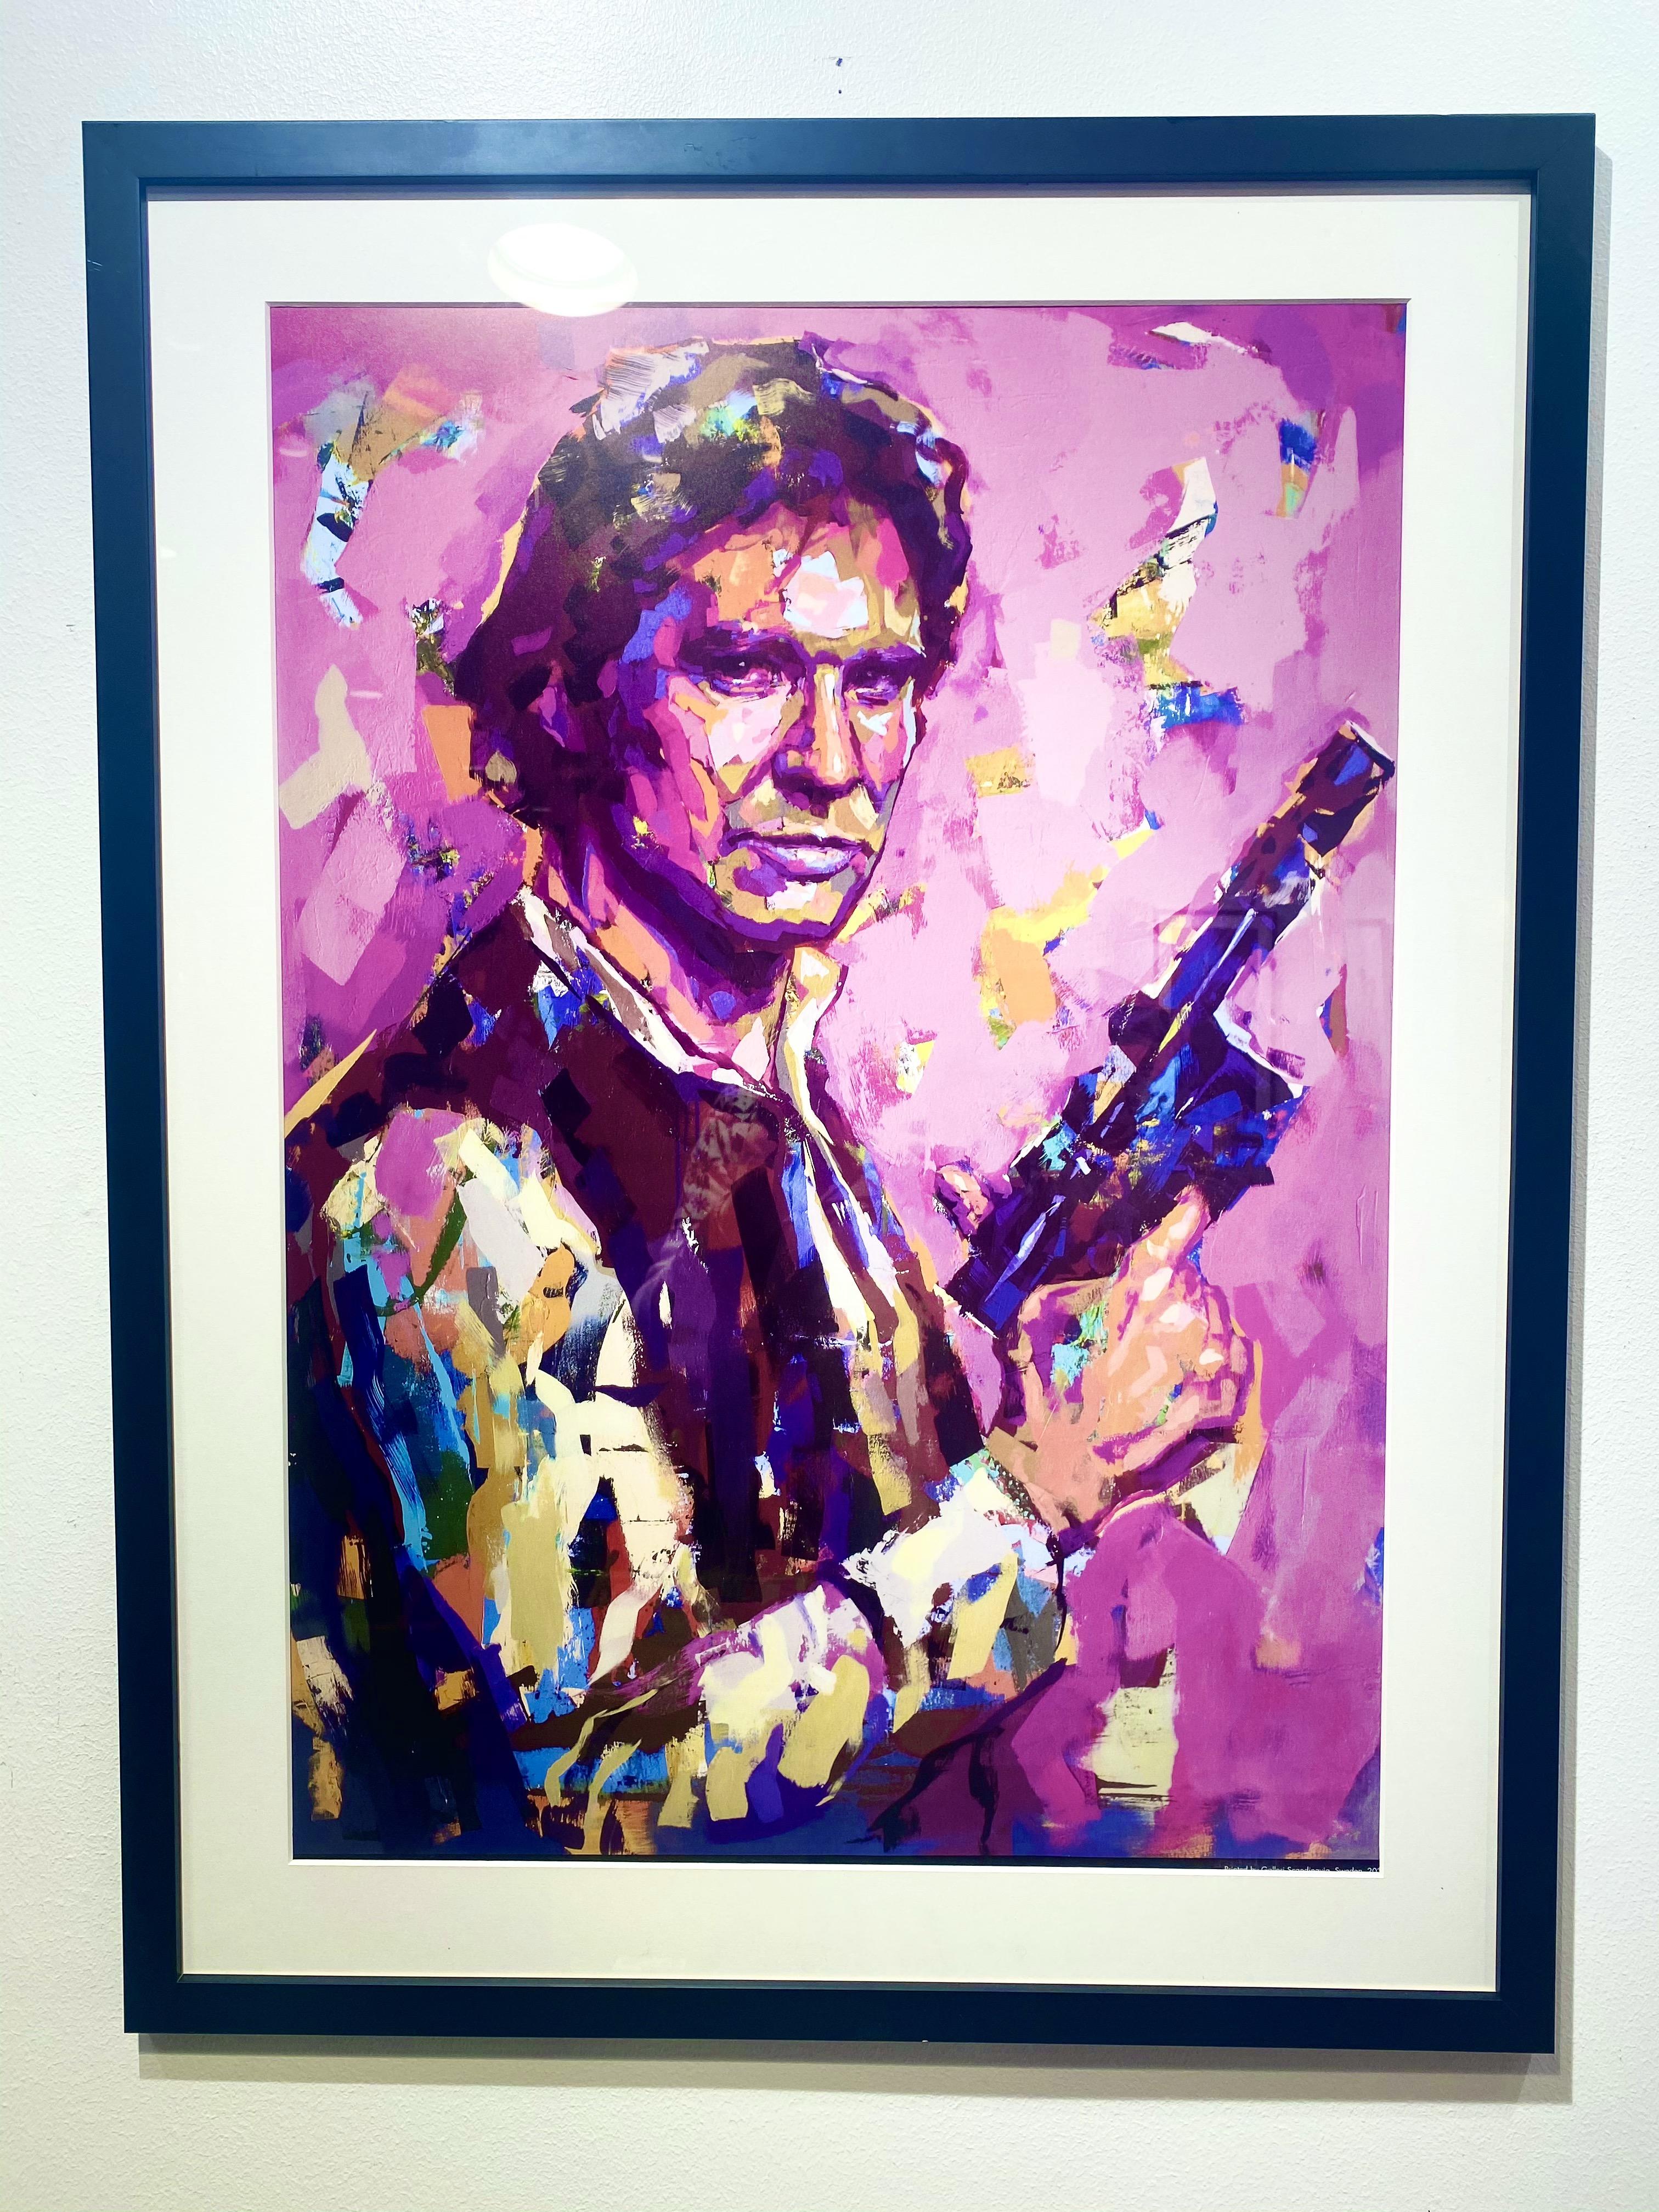 """Han Solo"" Limited Edition av LEG 50x70 cm"